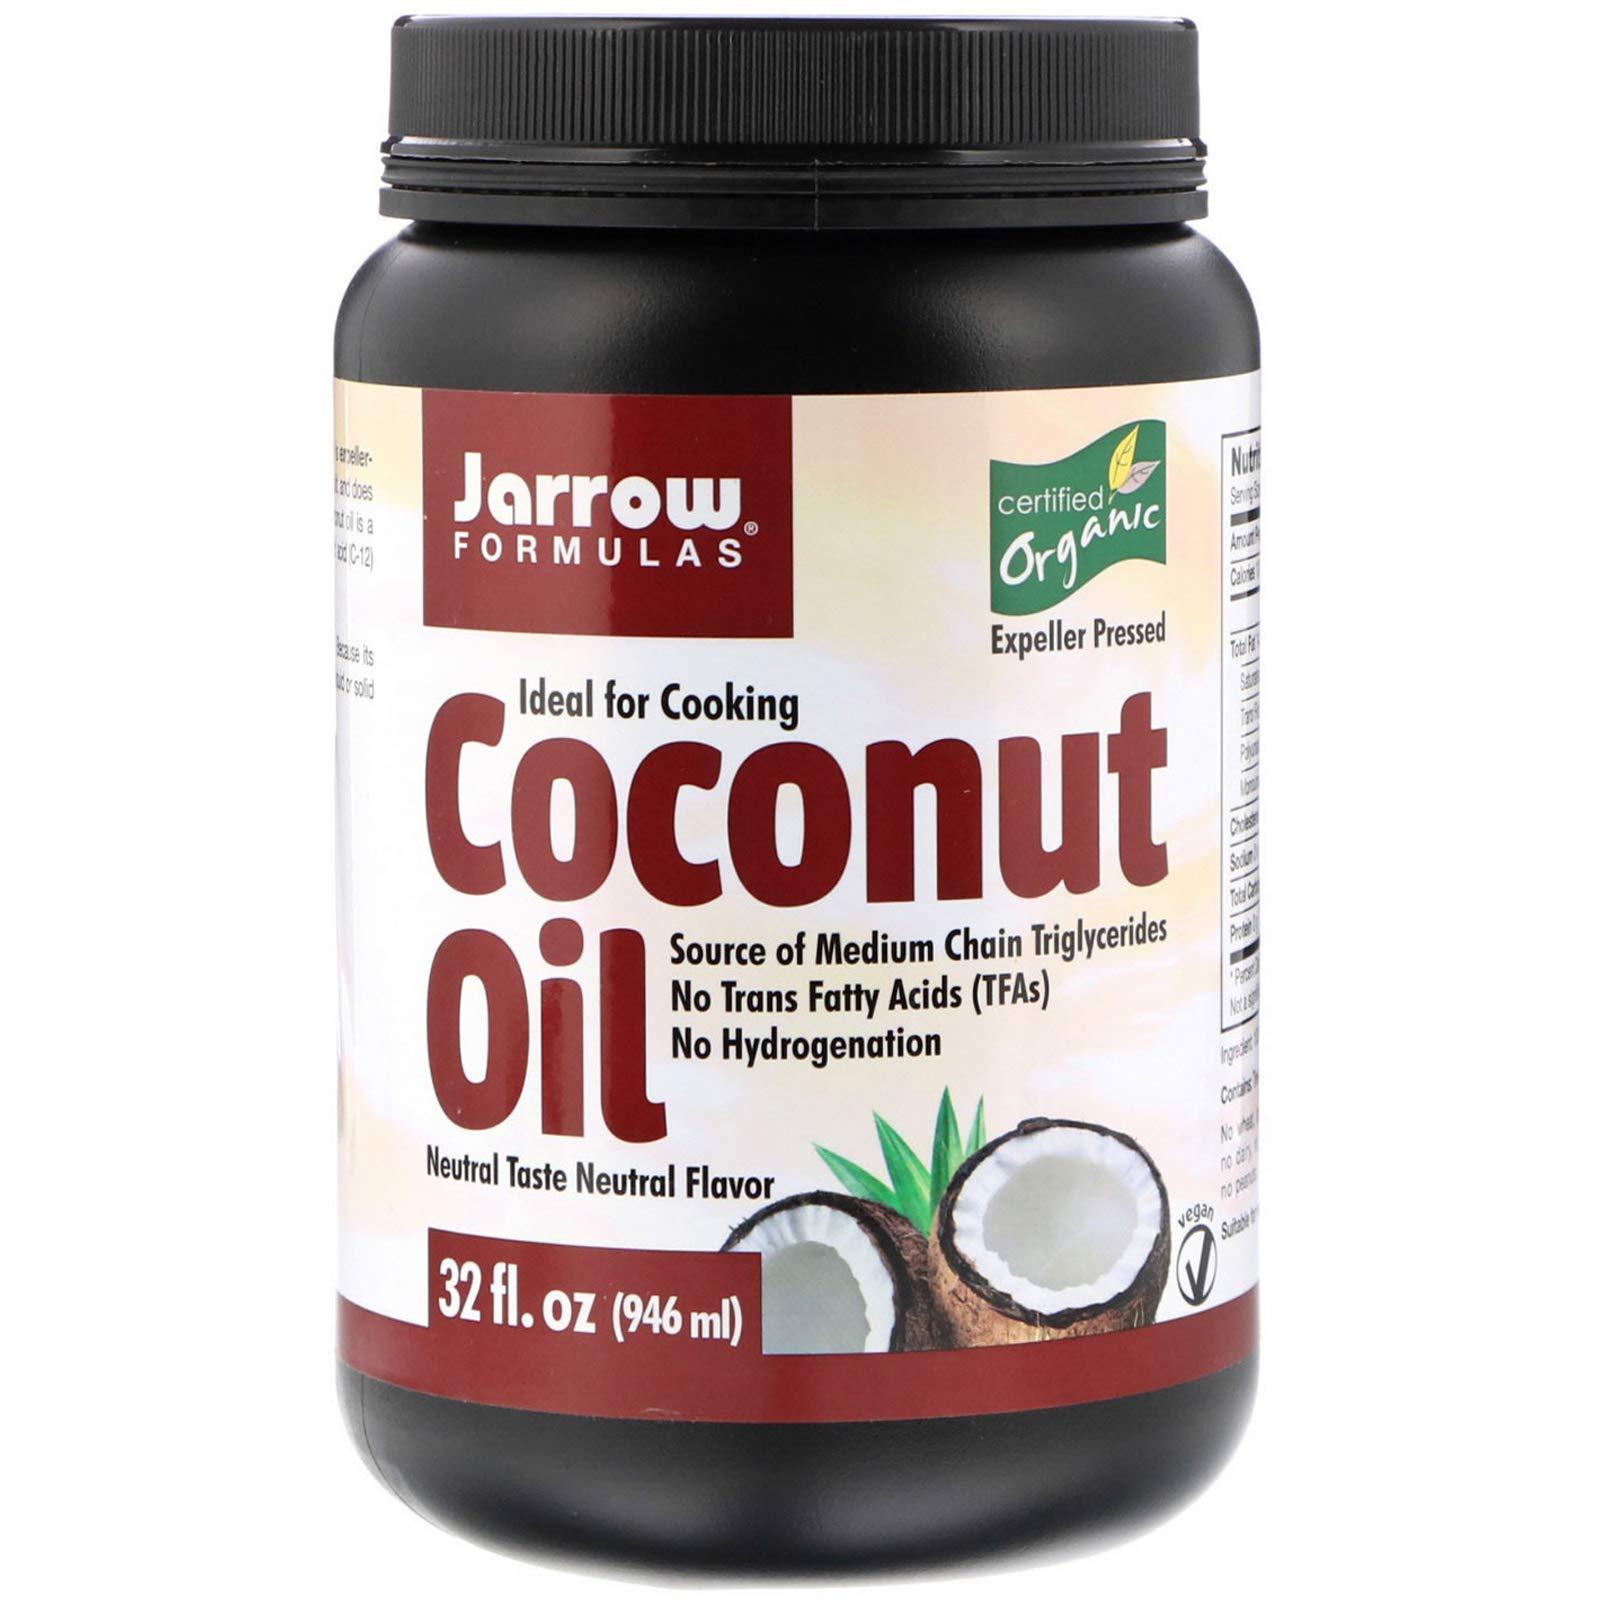 Jarrow Formulas, Organic Coconut Oil, Expeller Pressed, 32 fl oz (946 ml)